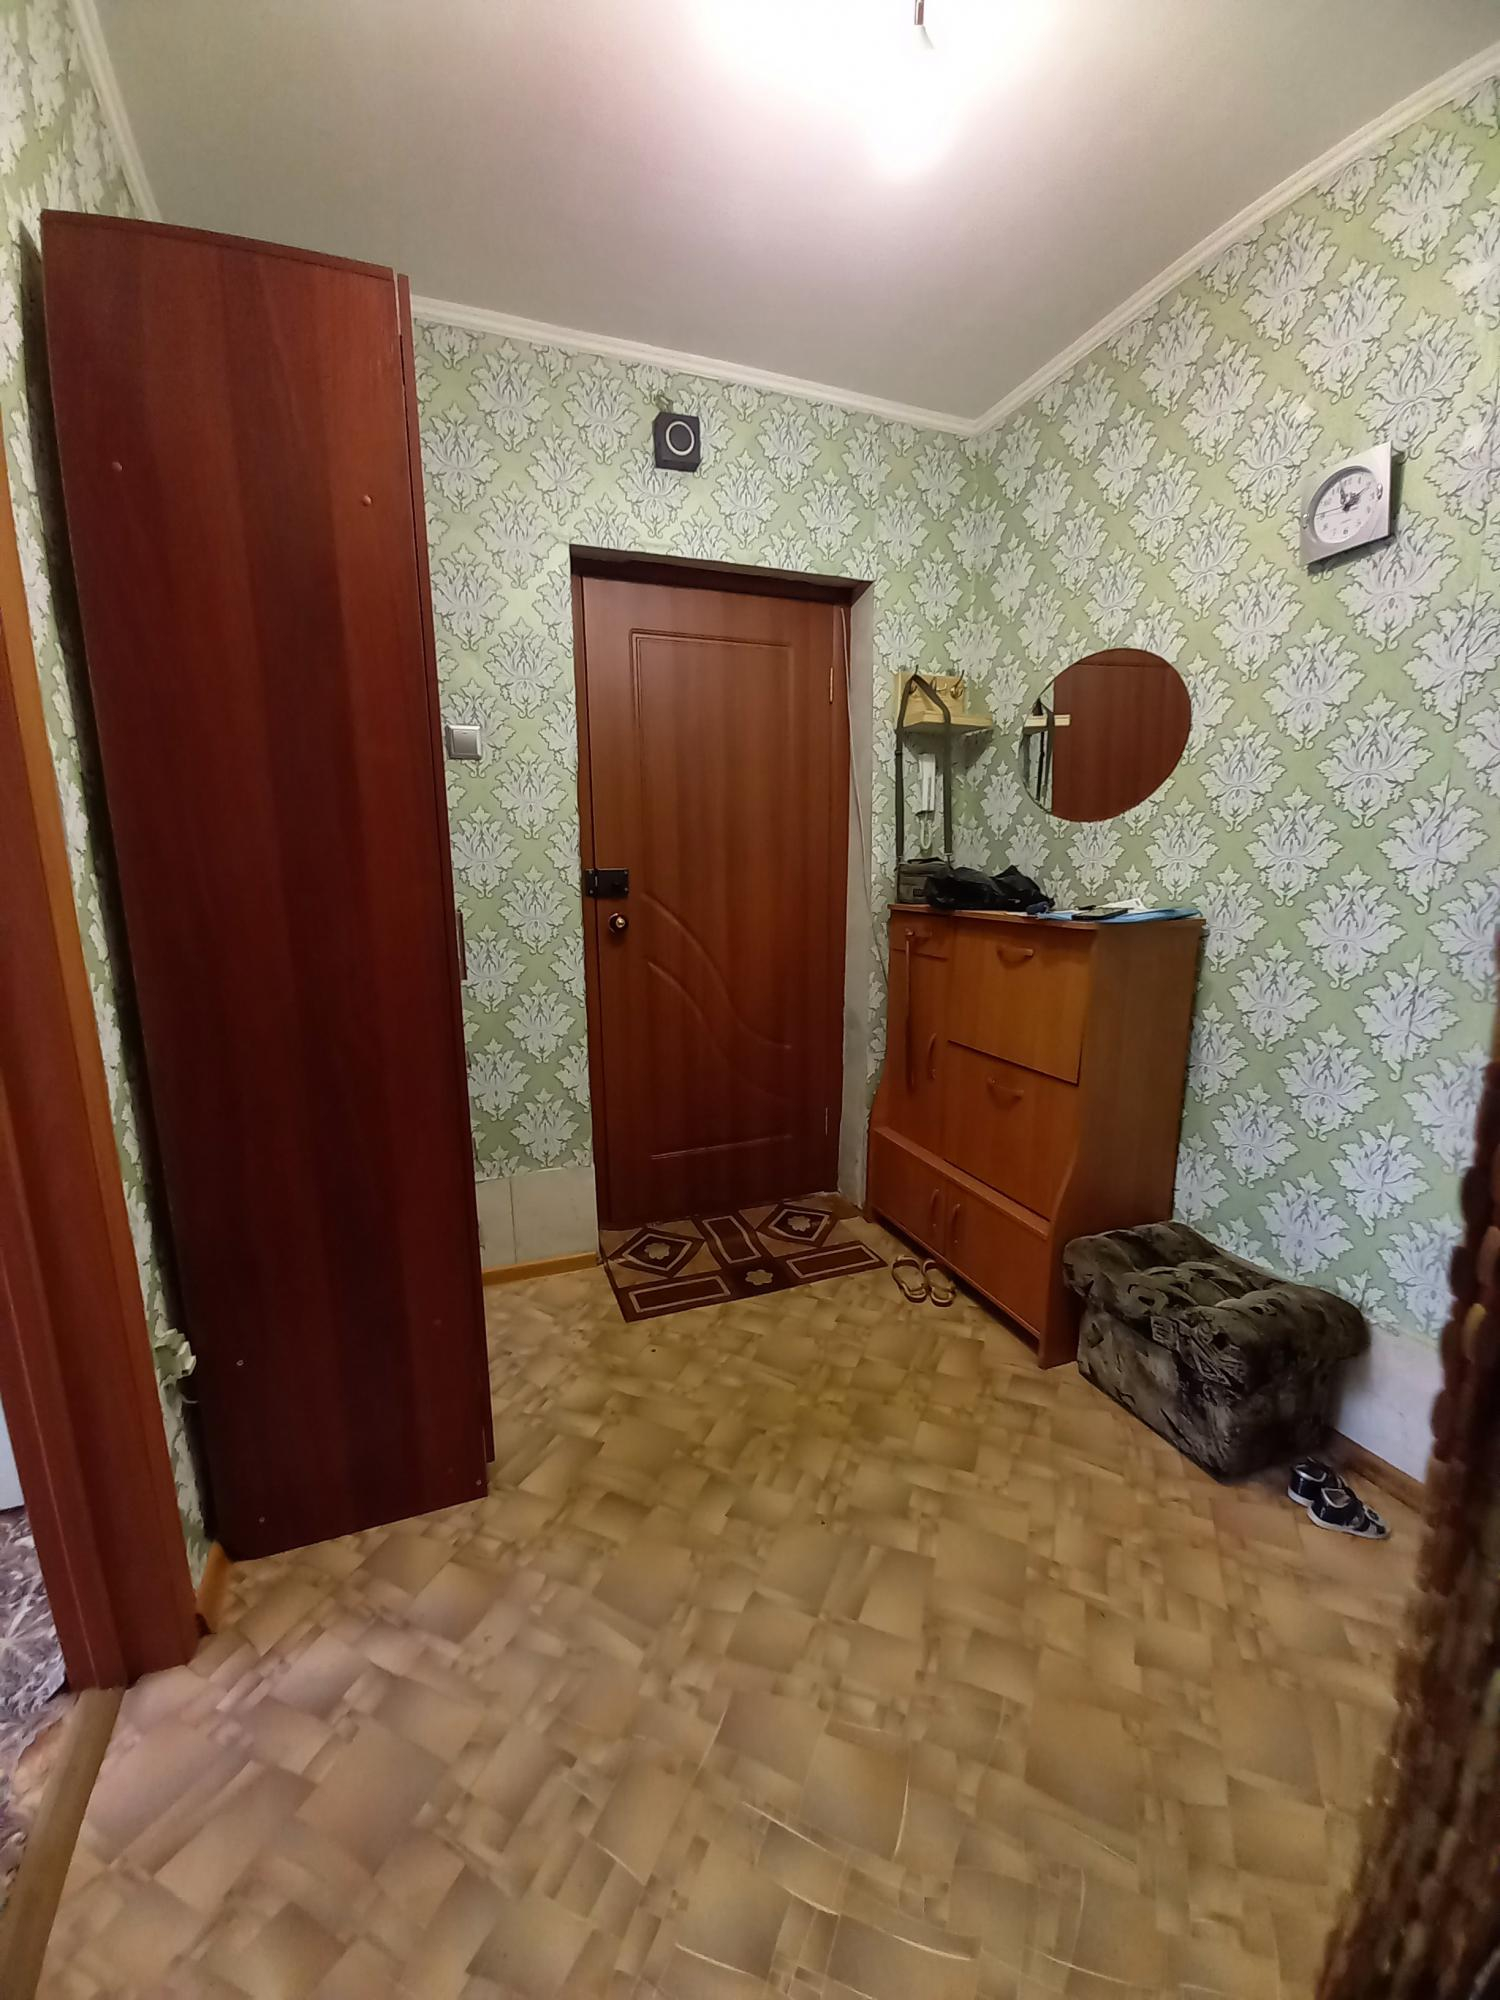 2к квартира улица Семафорная, 439 корпус 1а   17000   аренда в Красноярске фото 8